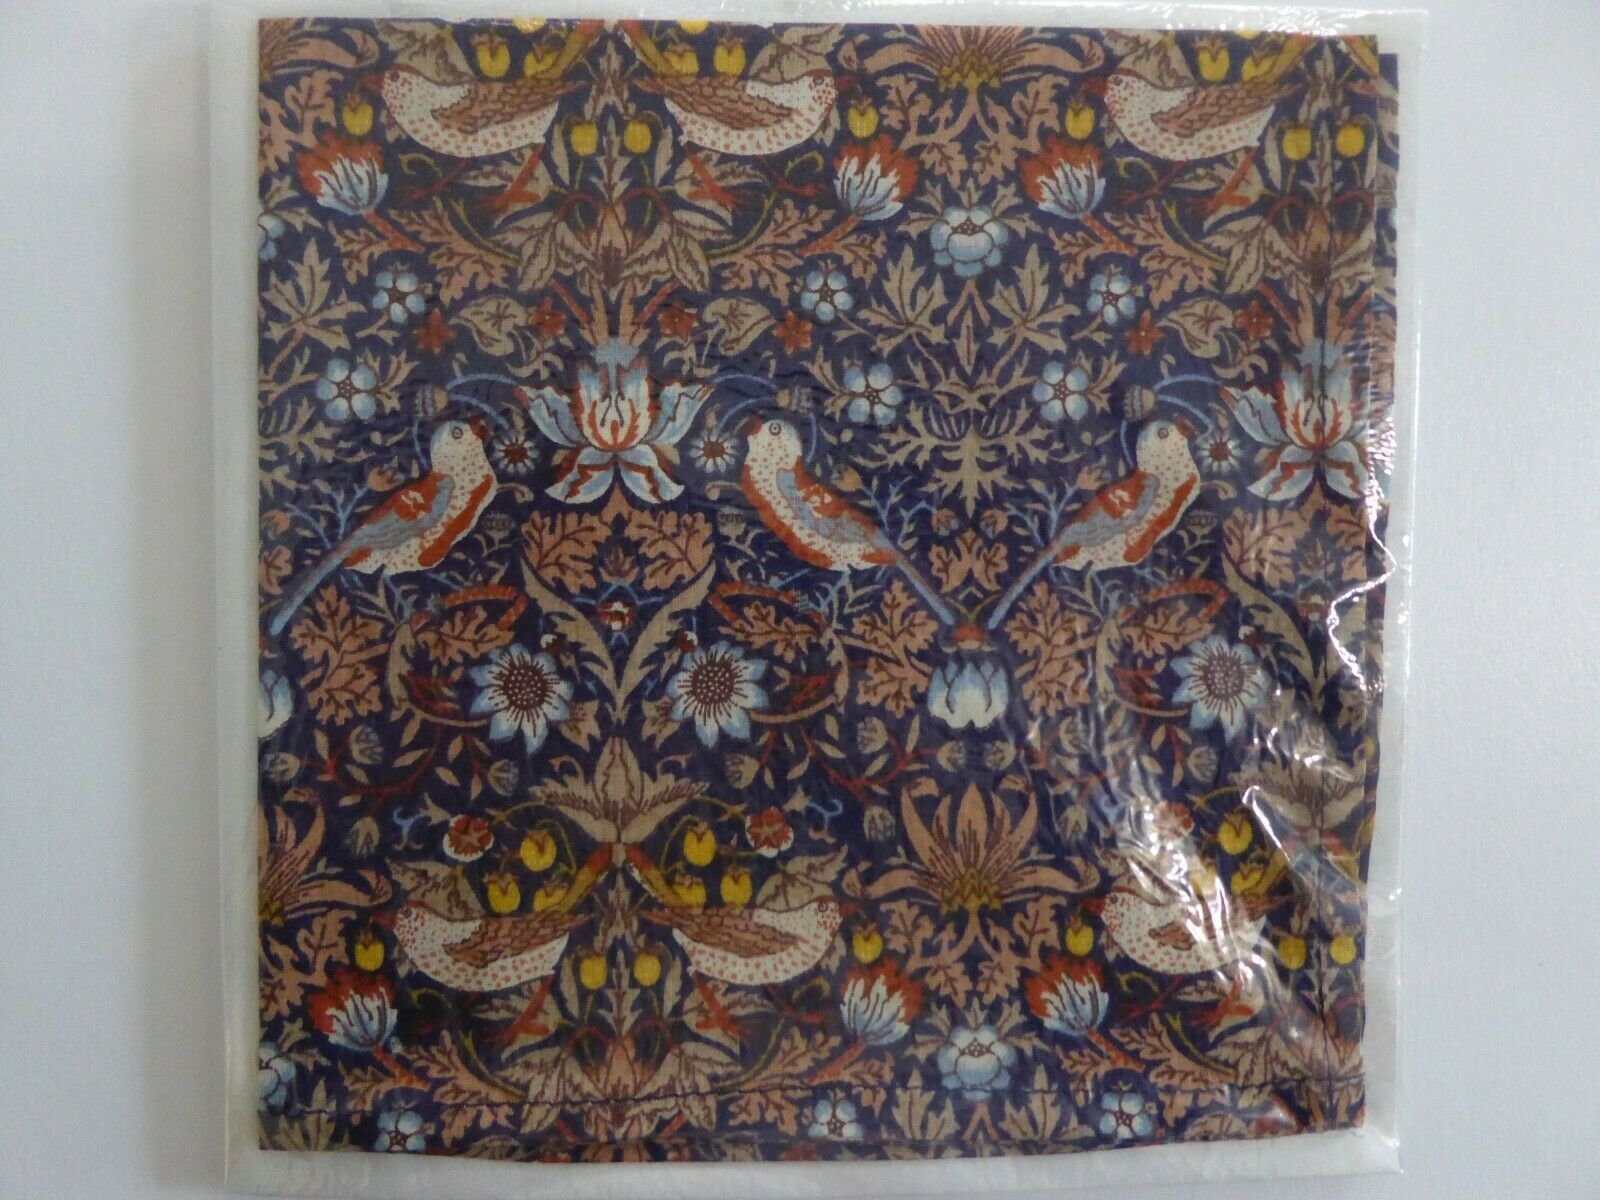 Liberty of London Fabric Handkerchief Hand Crafted, Strawberry Thief Design